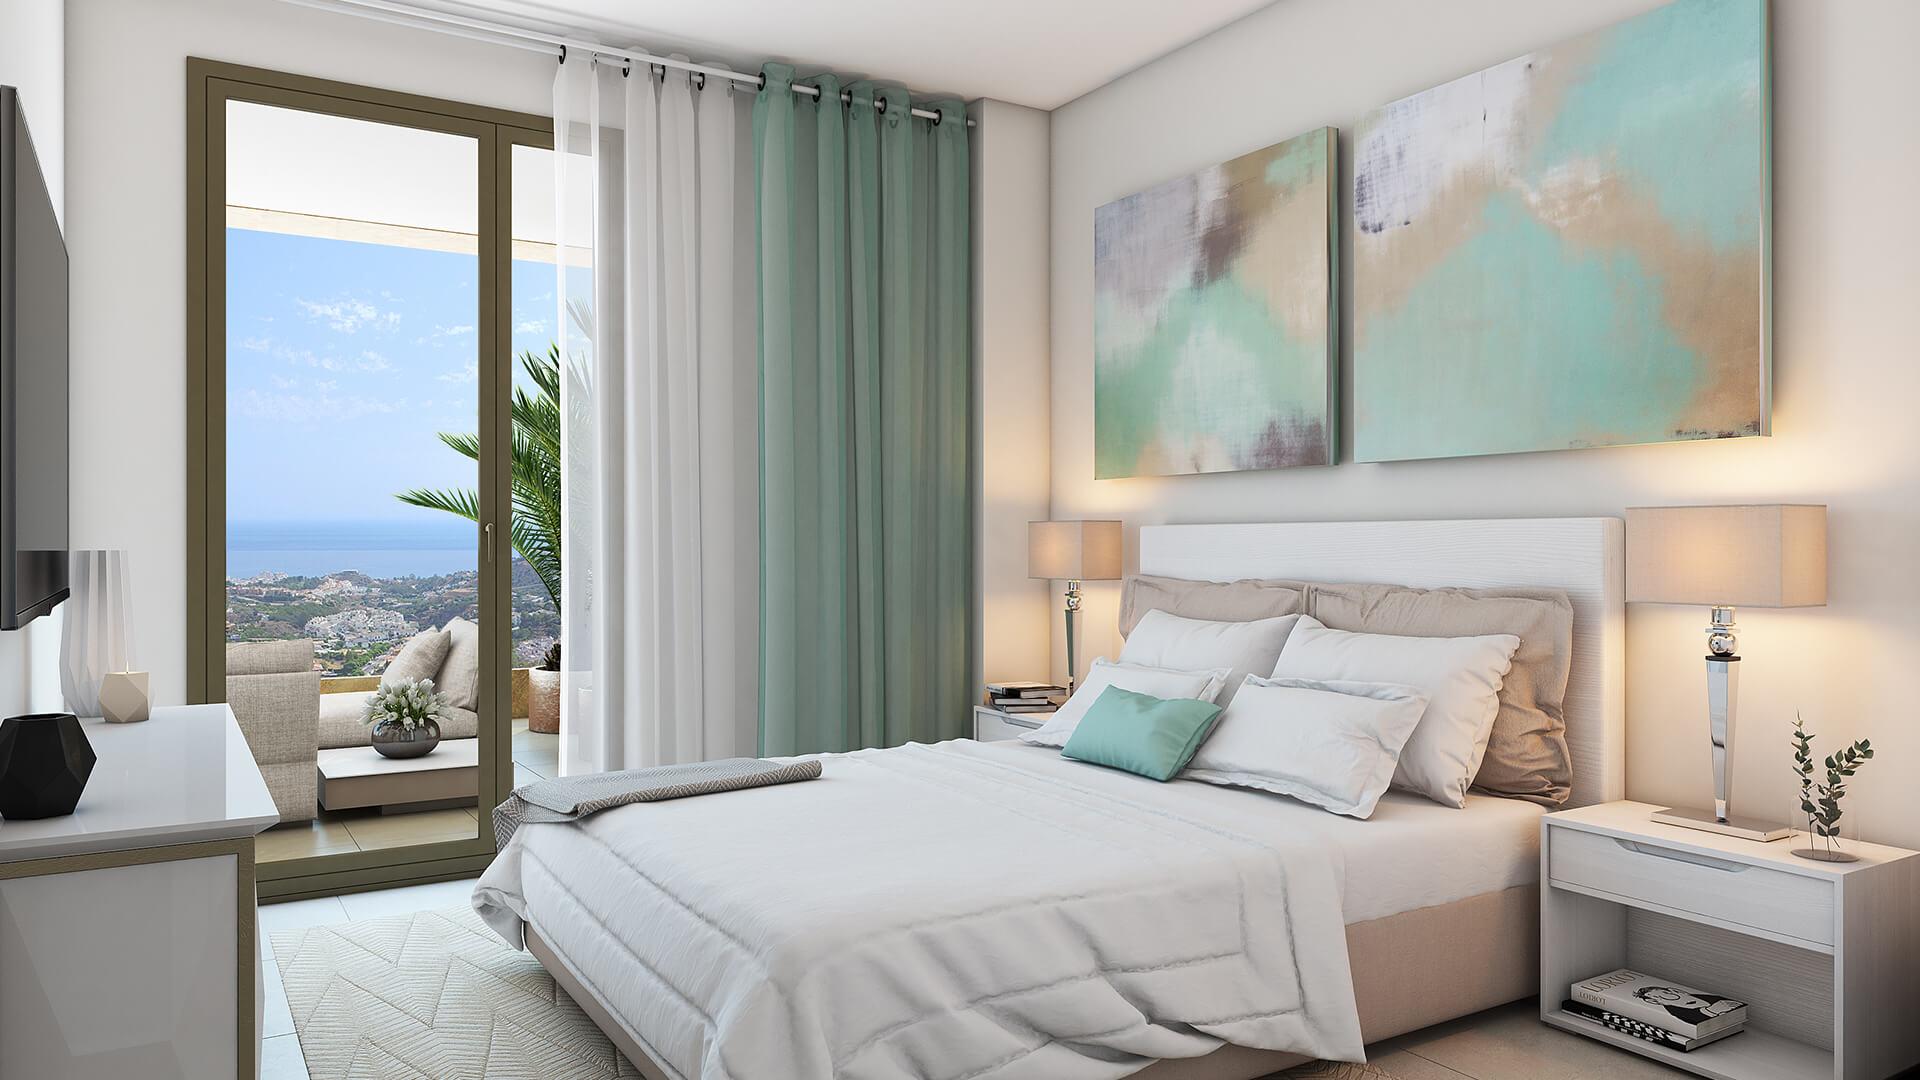 Apartment in Benalmadena MA2580293 6